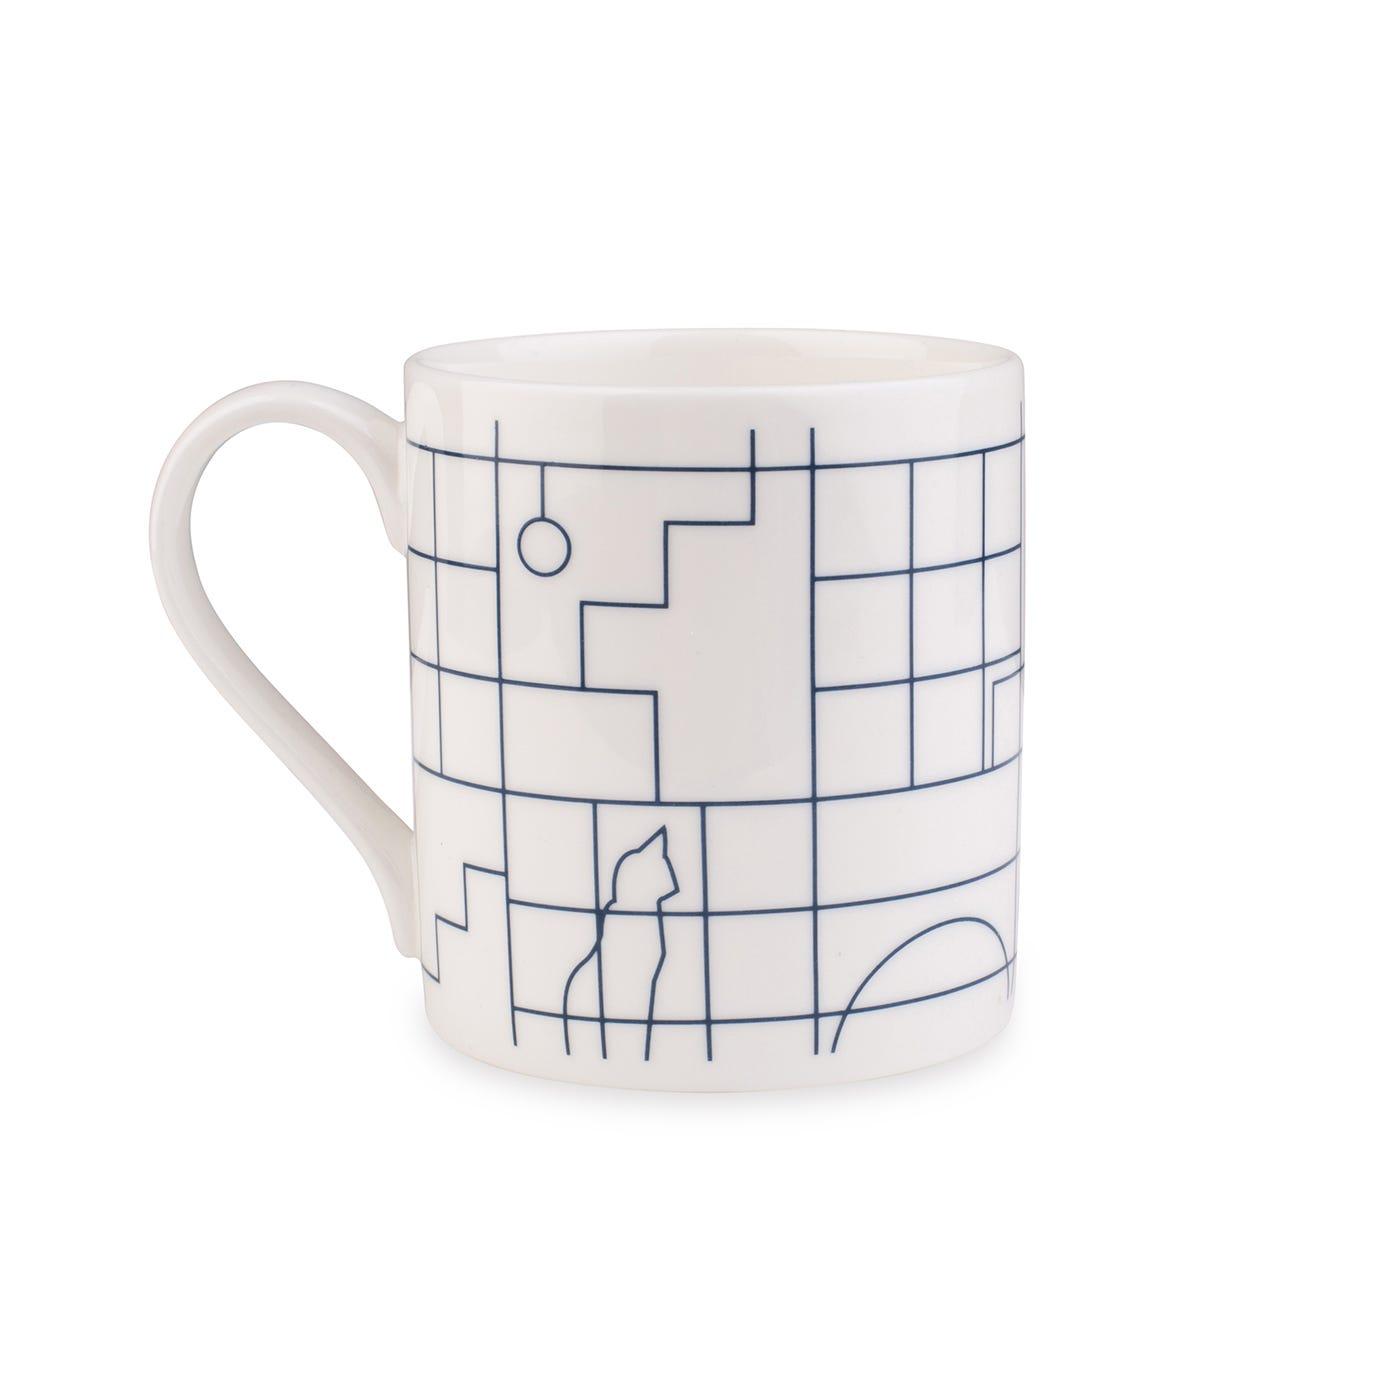 Heal's Cat Mug